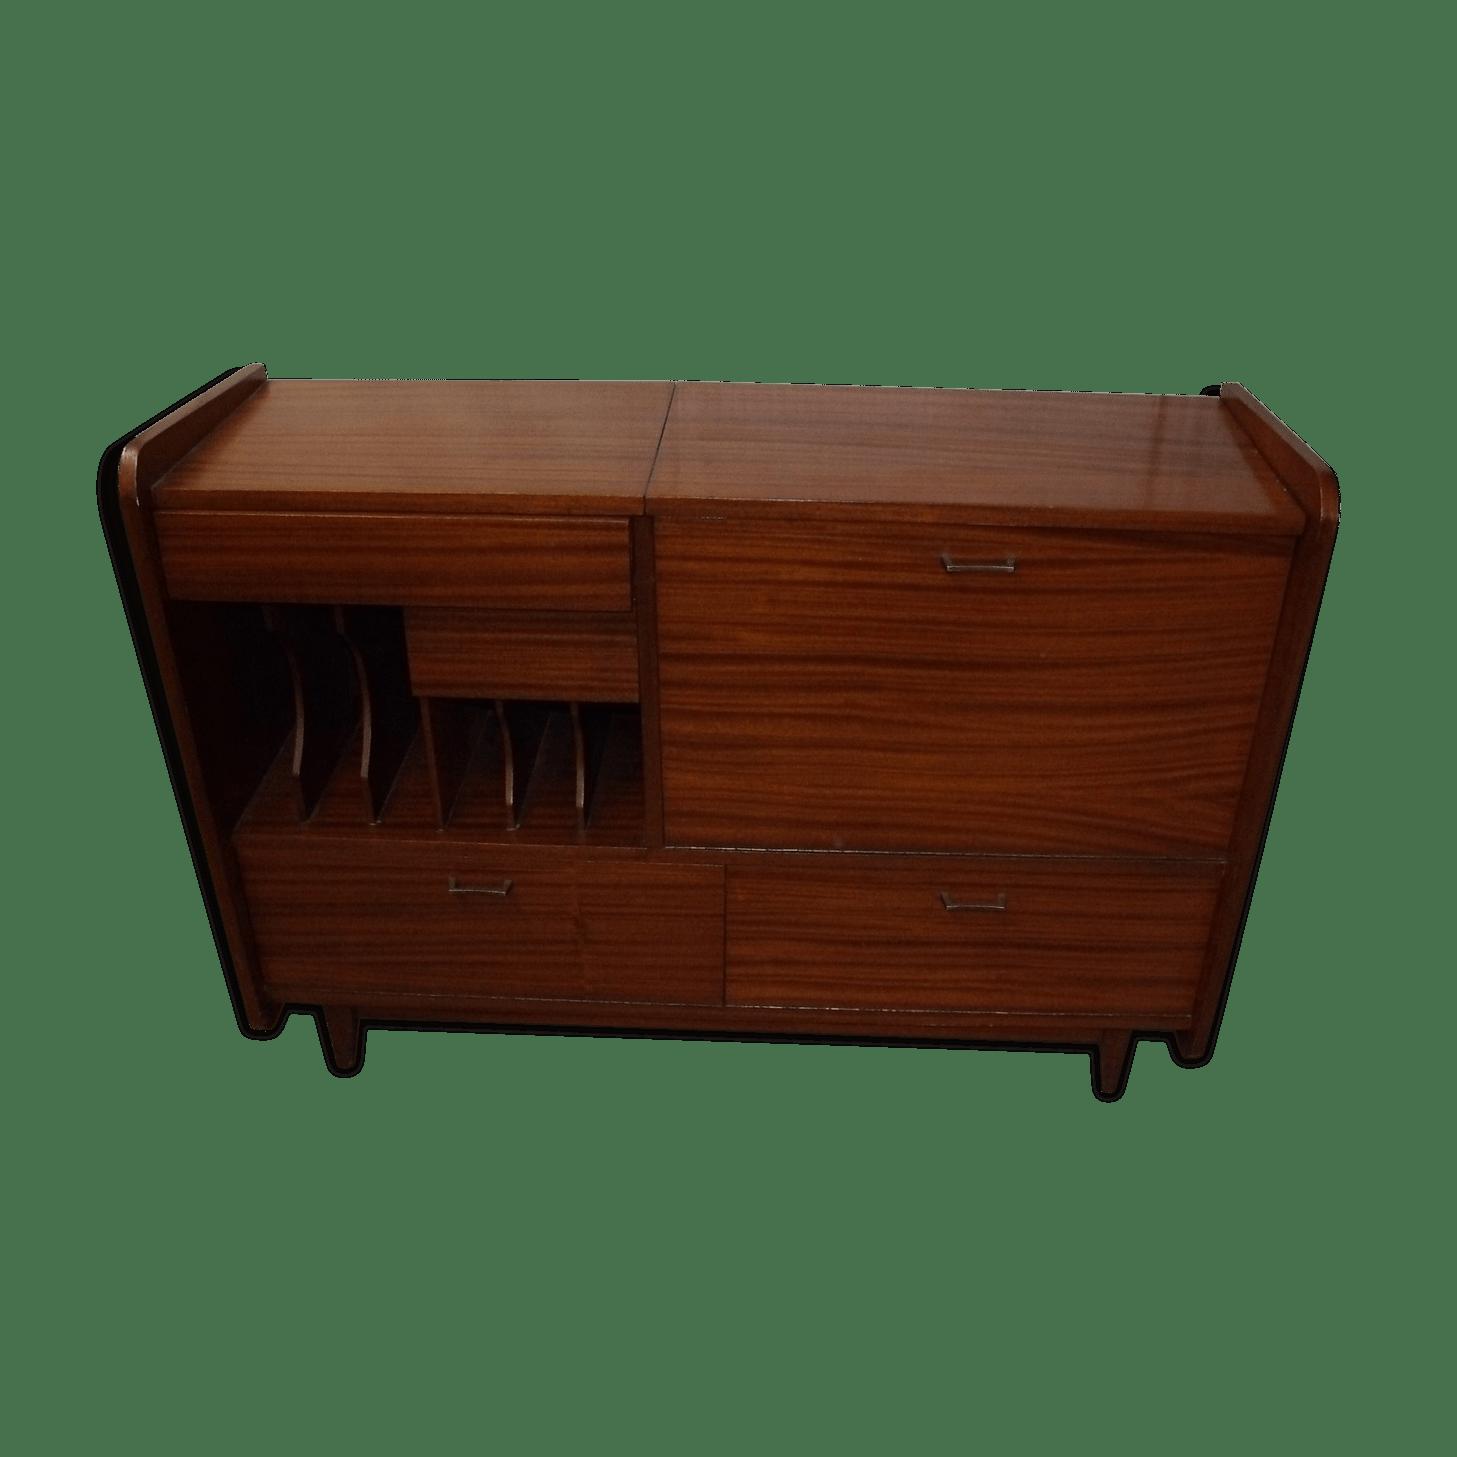 meubles rangements vinyls rangement pour vinyl elegant. Black Bedroom Furniture Sets. Home Design Ideas